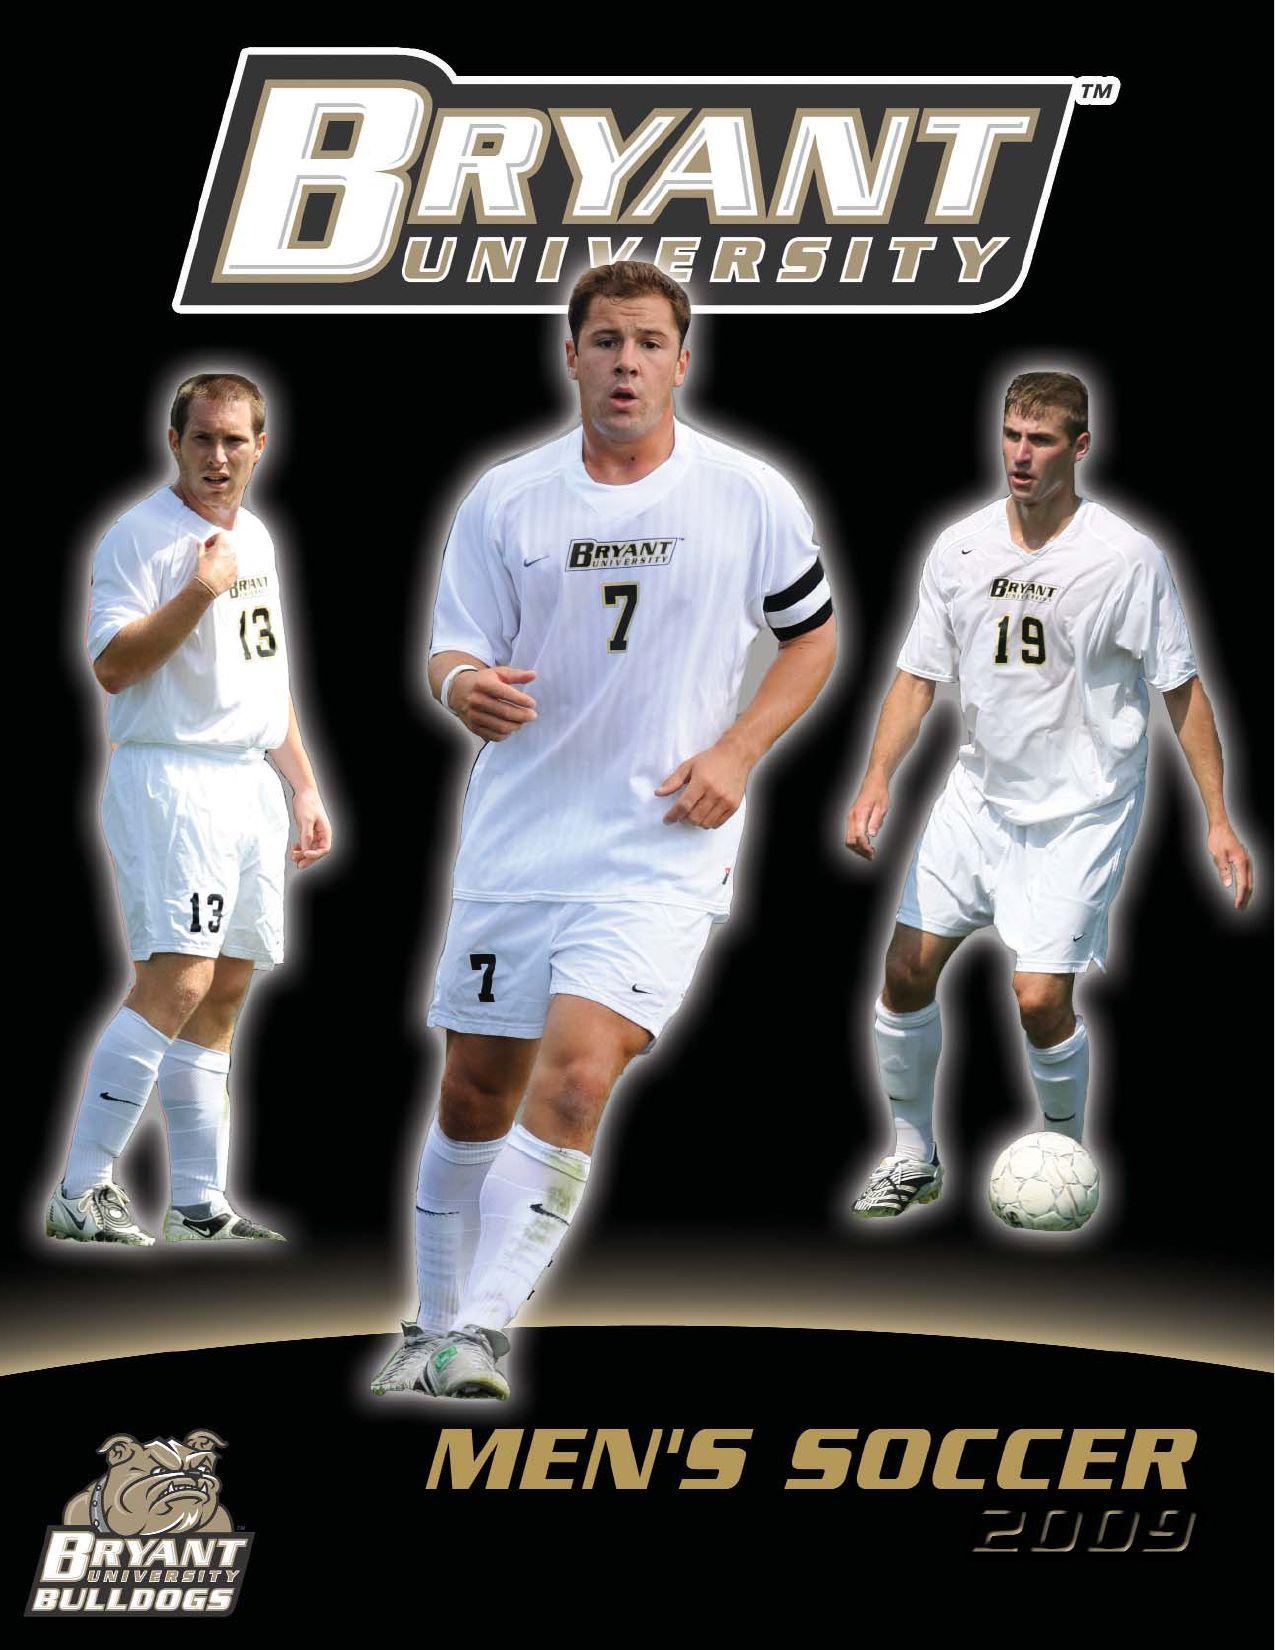 wholesale dealer 98cd0 a457b 2009 Bryant University Men's Soccer Media Guide by Allie ...